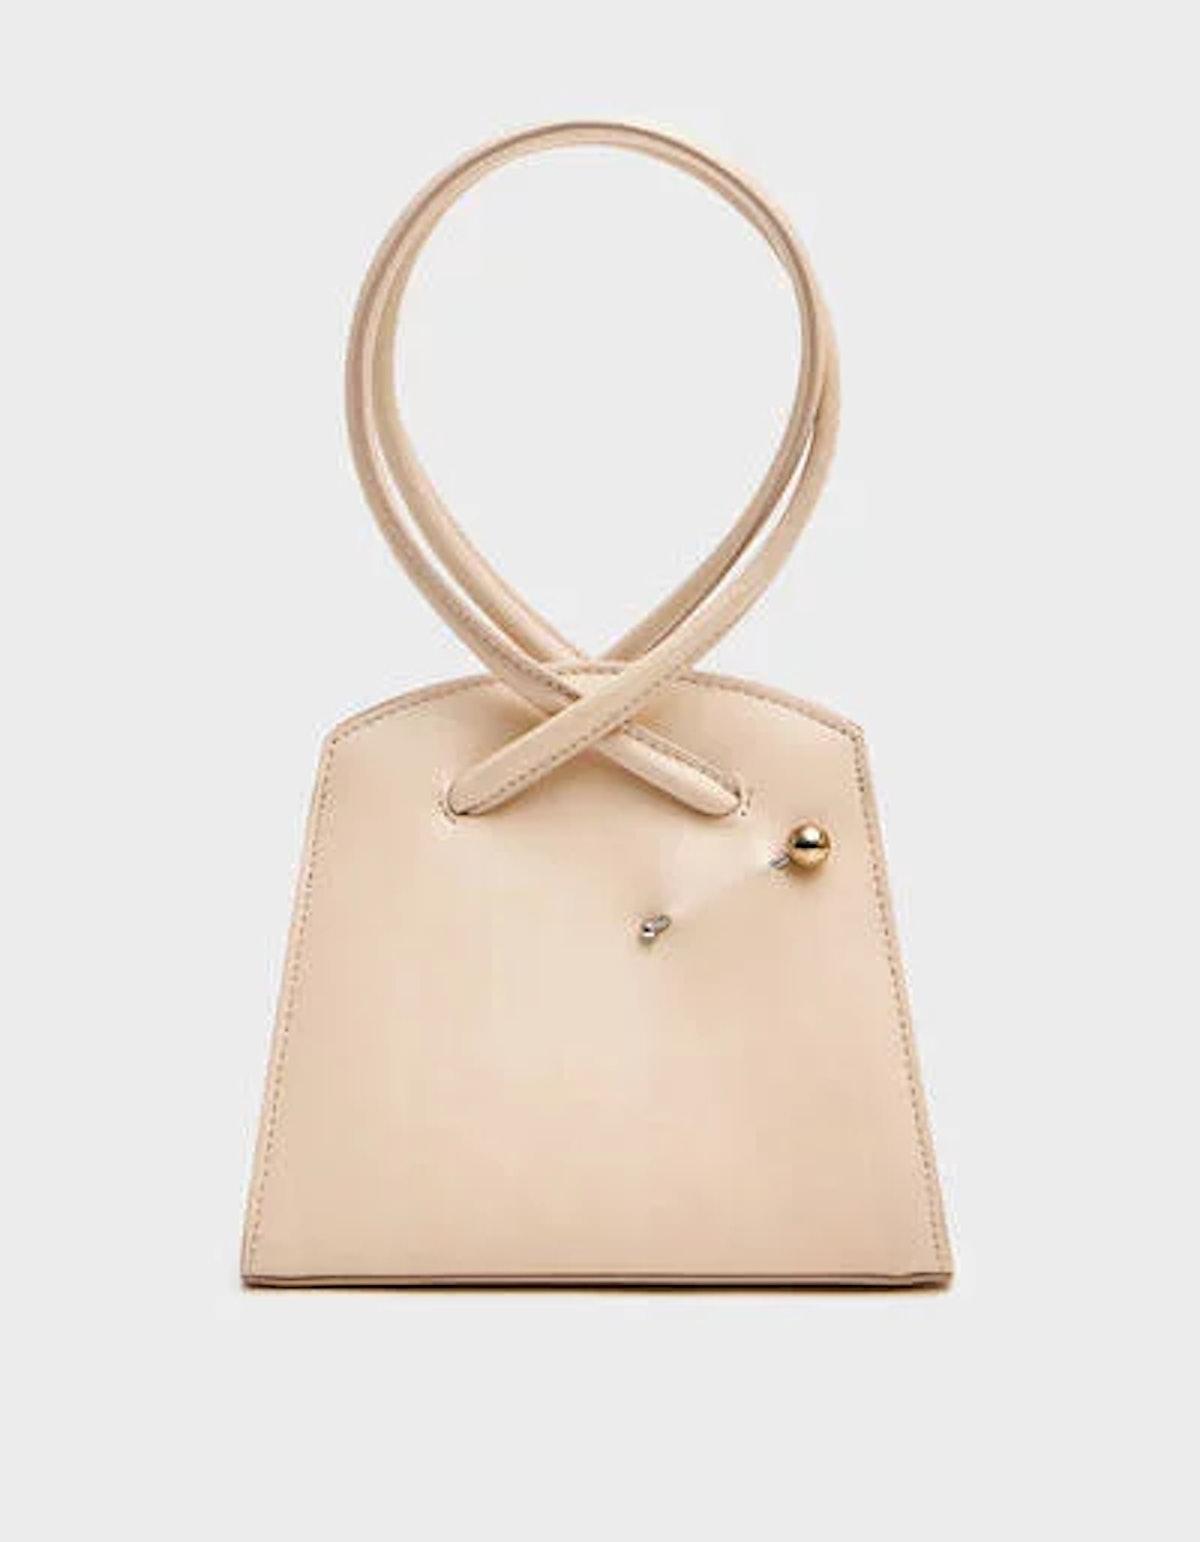 Twisted Triangle Bag